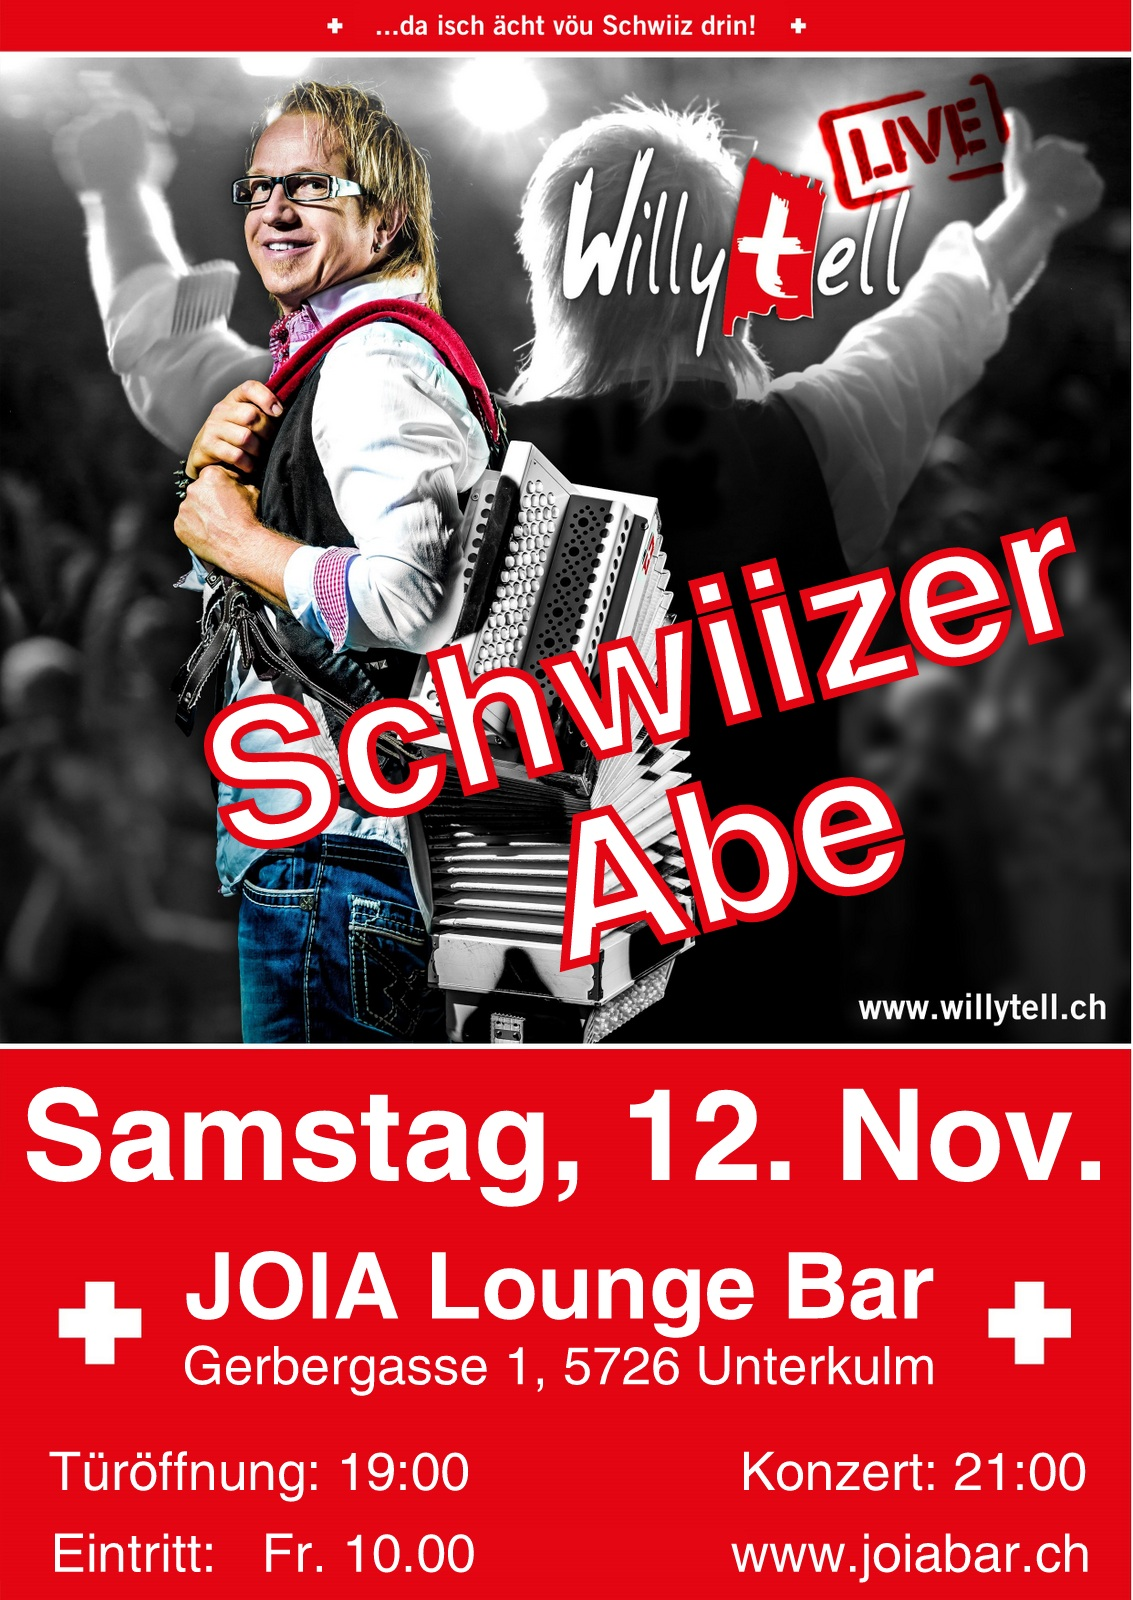 Joia Lounge Bar Nov. 2016